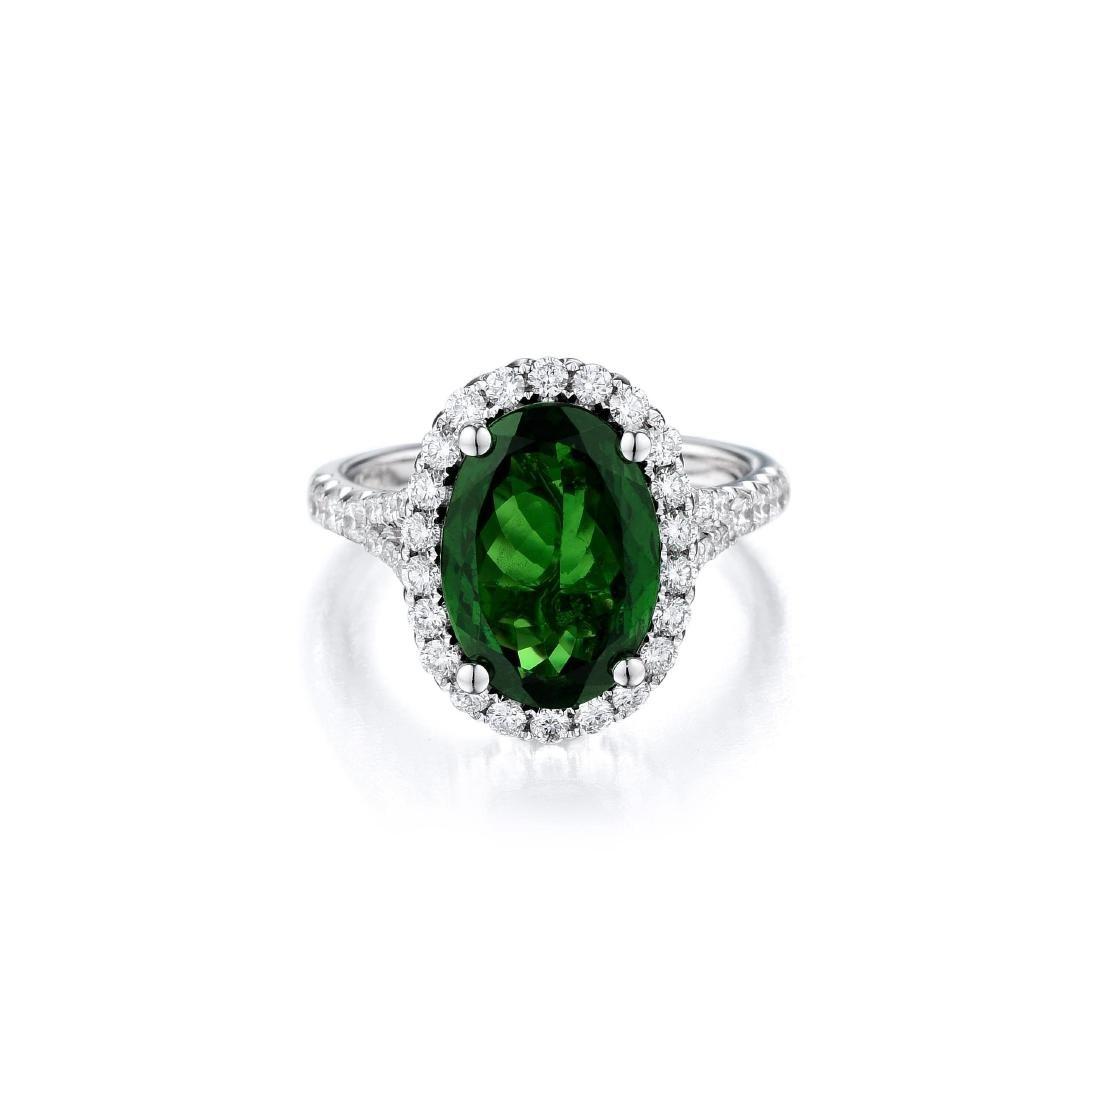 A 3.62-Carat Tsavorite and Diamond Ring